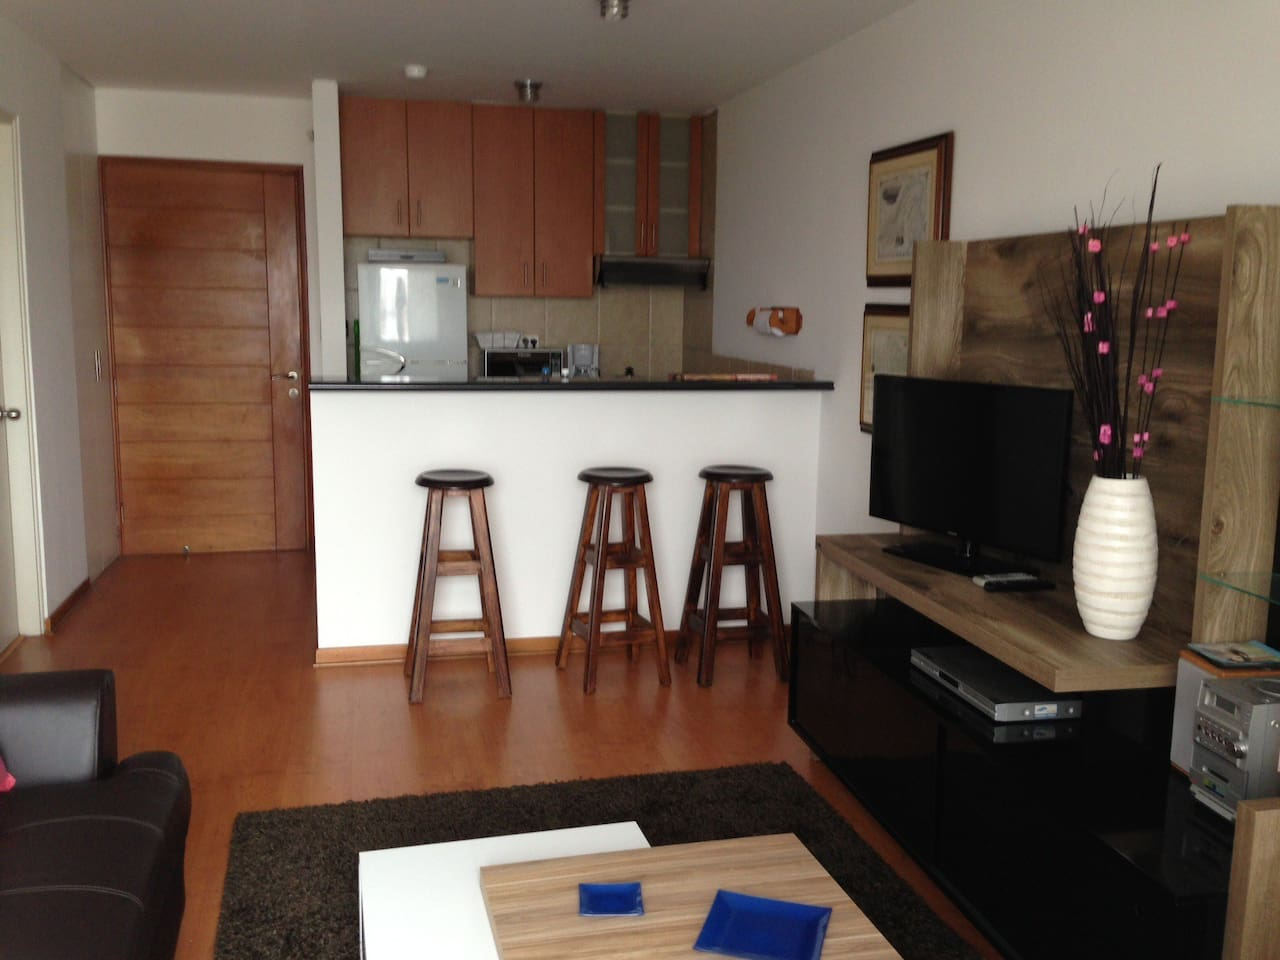 One bedroom apartment in Miraflores